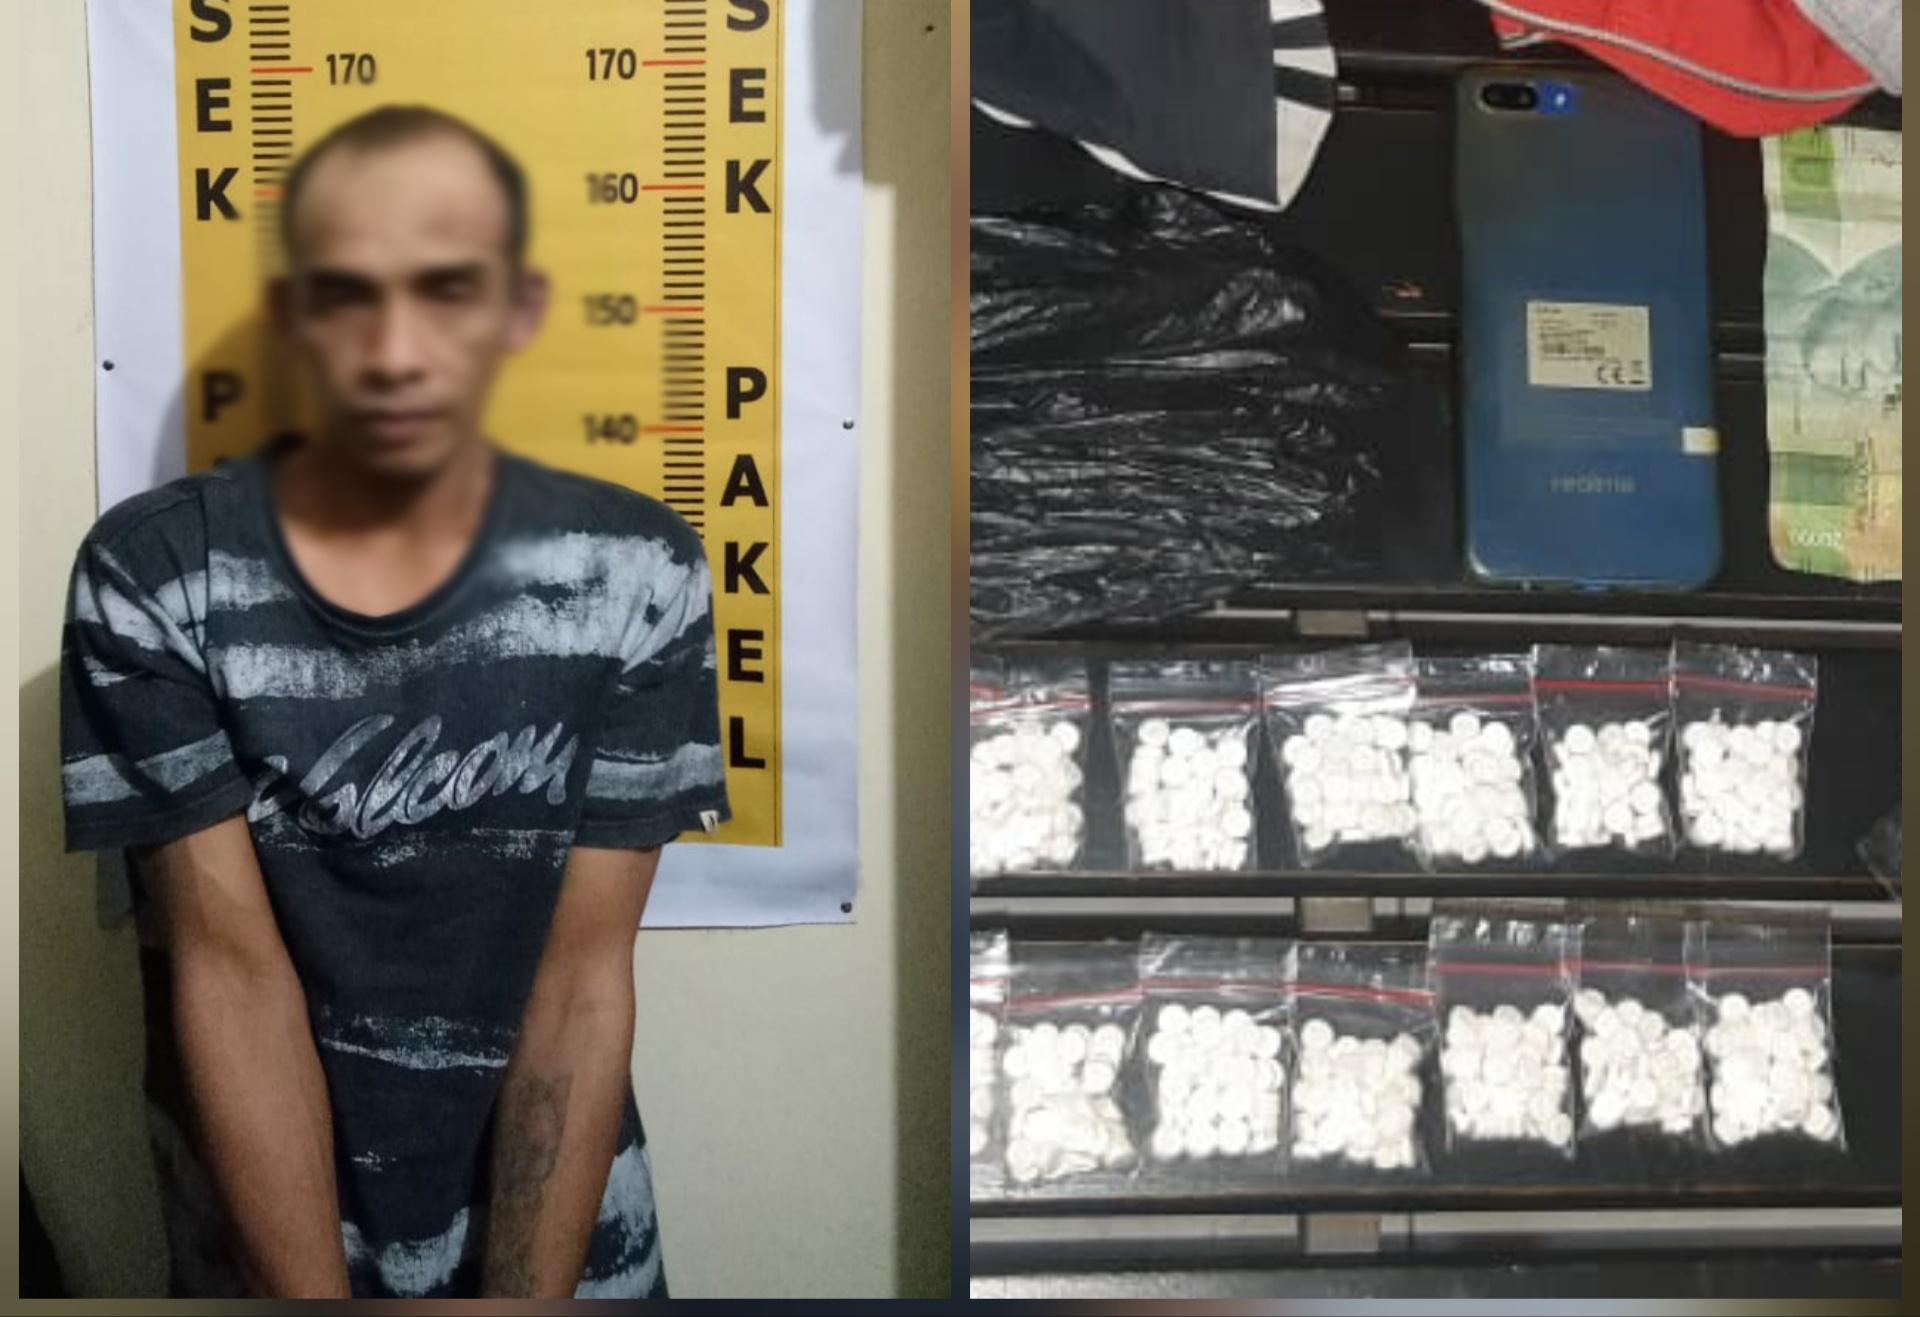 Tersangka Endik Susilo alias Kasus beserta barang bukti Dobel L (foto: Dokpol / TulungagungTIMES)